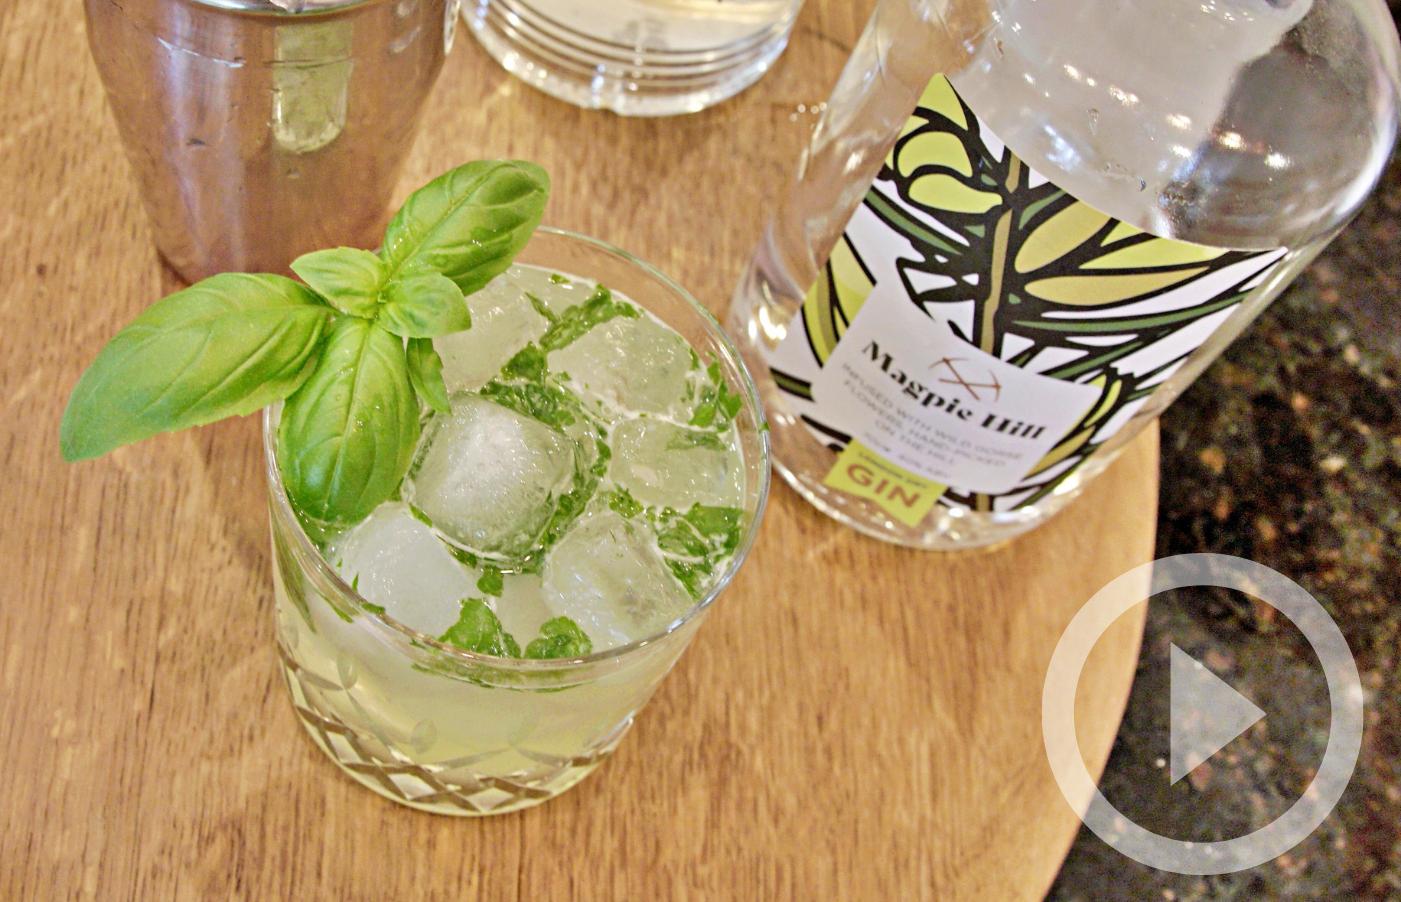 How to make a Basil Smash Cocktail